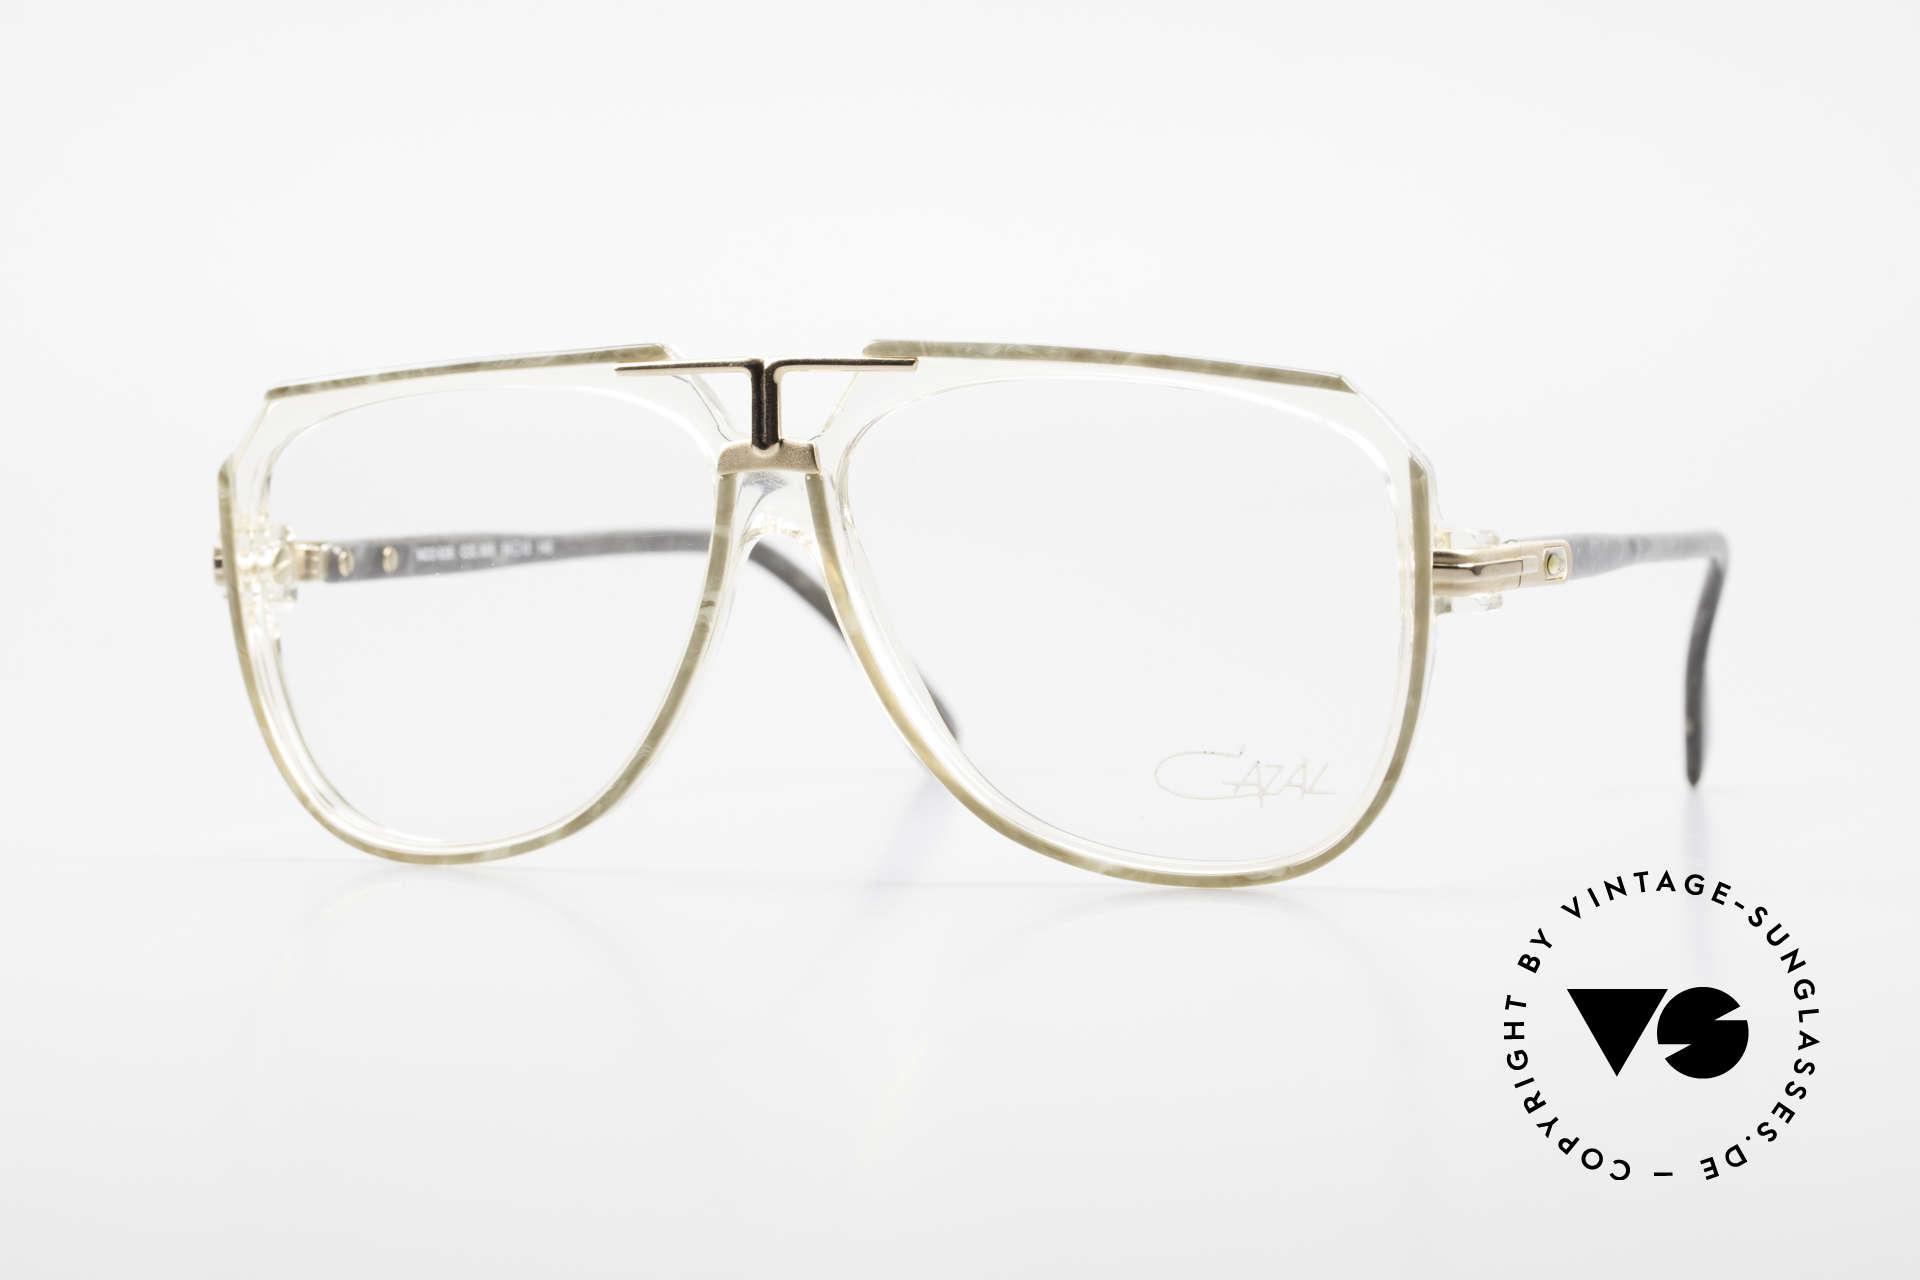 Cazal 636 Old West Germany 80's Cazal, vintage Cazal eyeglasses from app. 1986, Made for Men